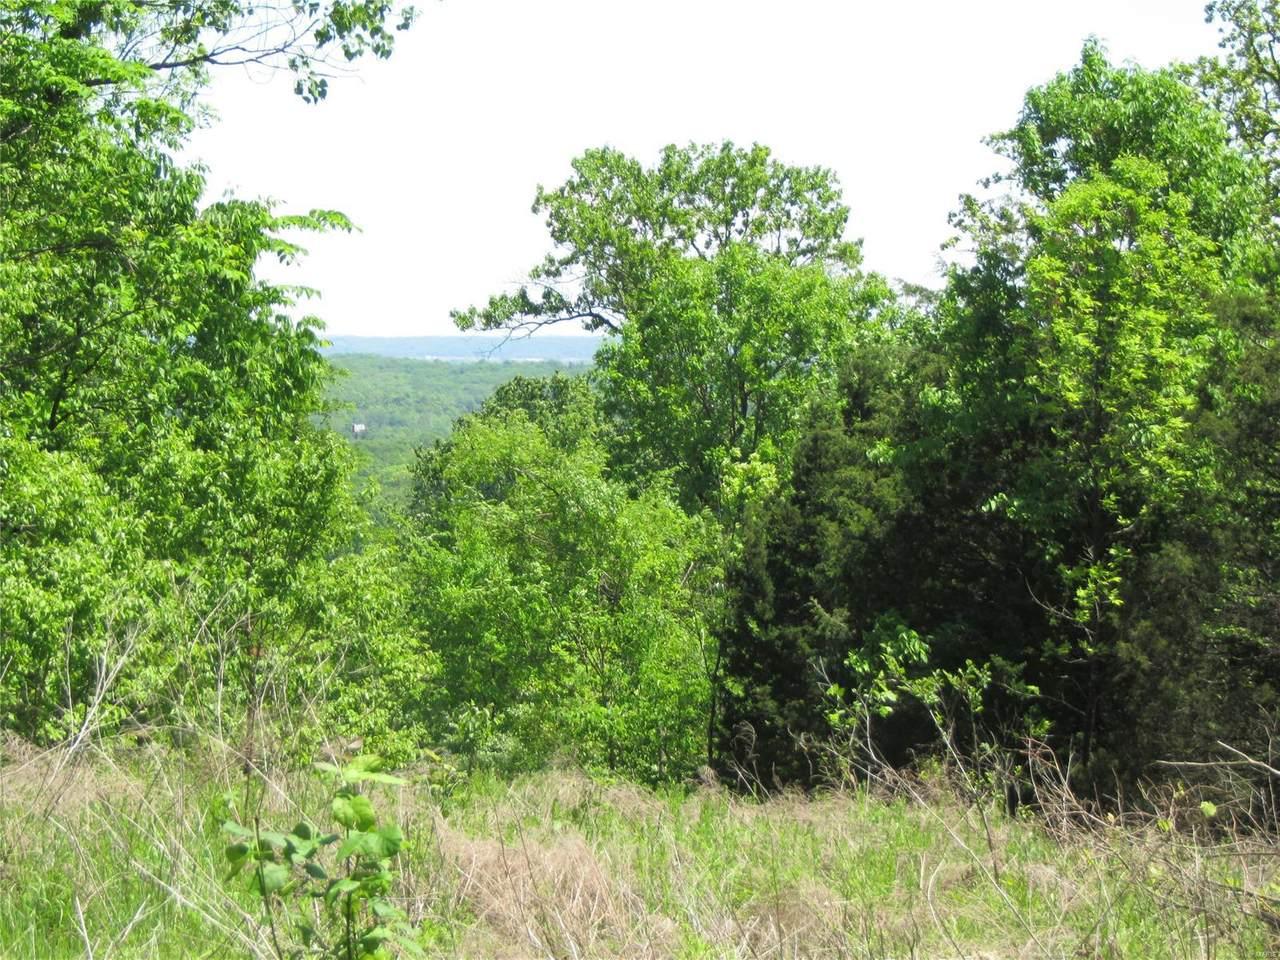 0 Meadow Dr. (89 Acres) - Photo 1